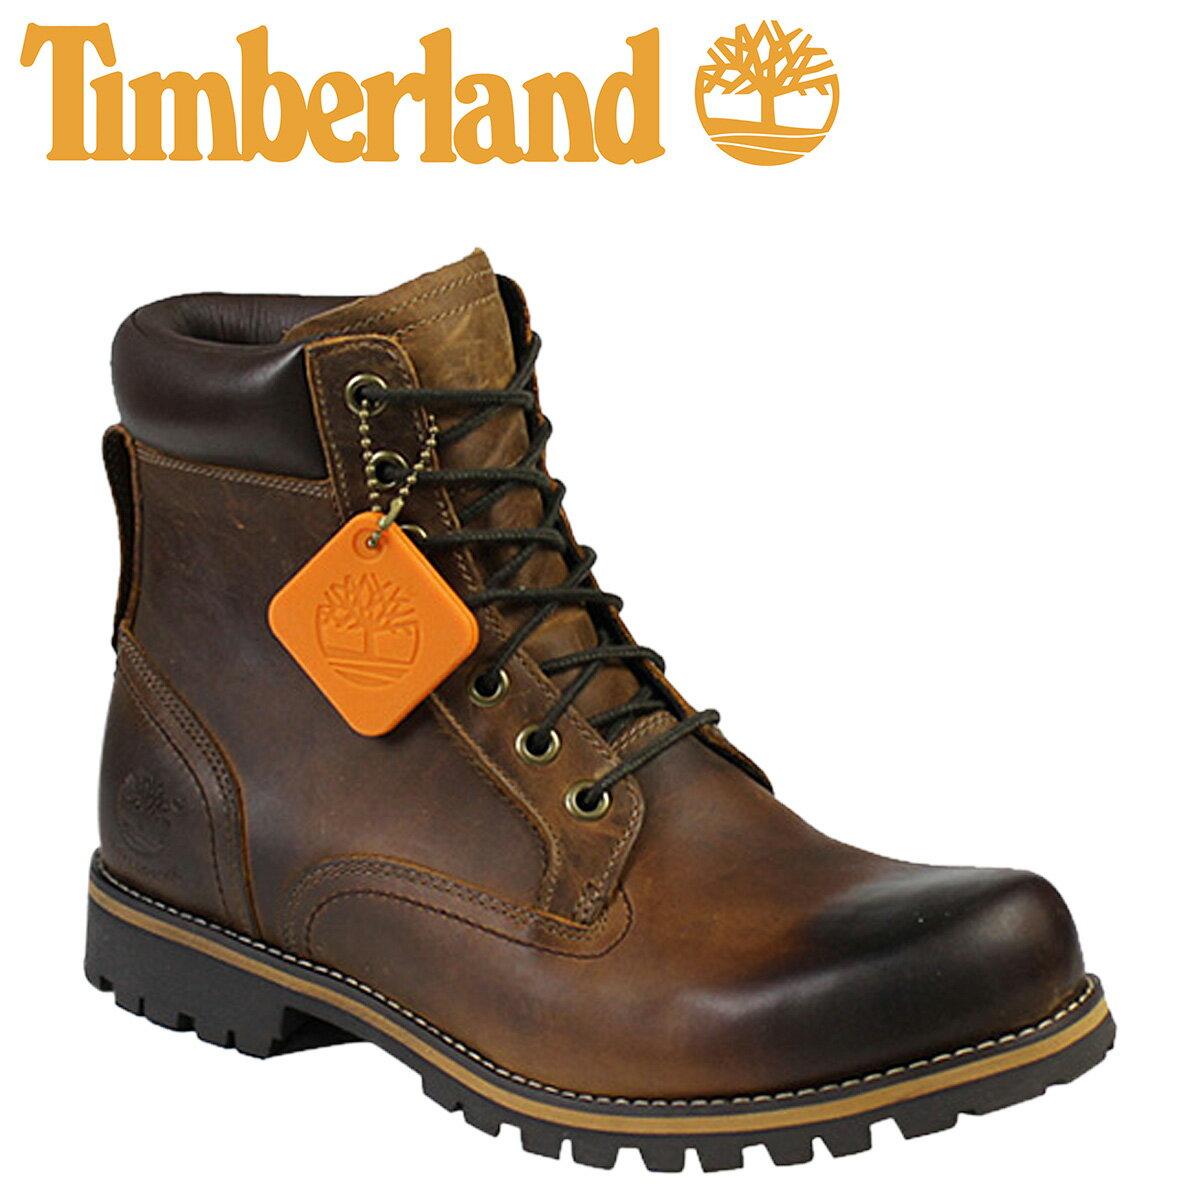 Timberland Timberland Earthkeepers Rugged 6 Inch Boots [Brown] 74134  Earthkeepers Rugged 6Inch Waterproof Boot Leather Menu0027s [regular]